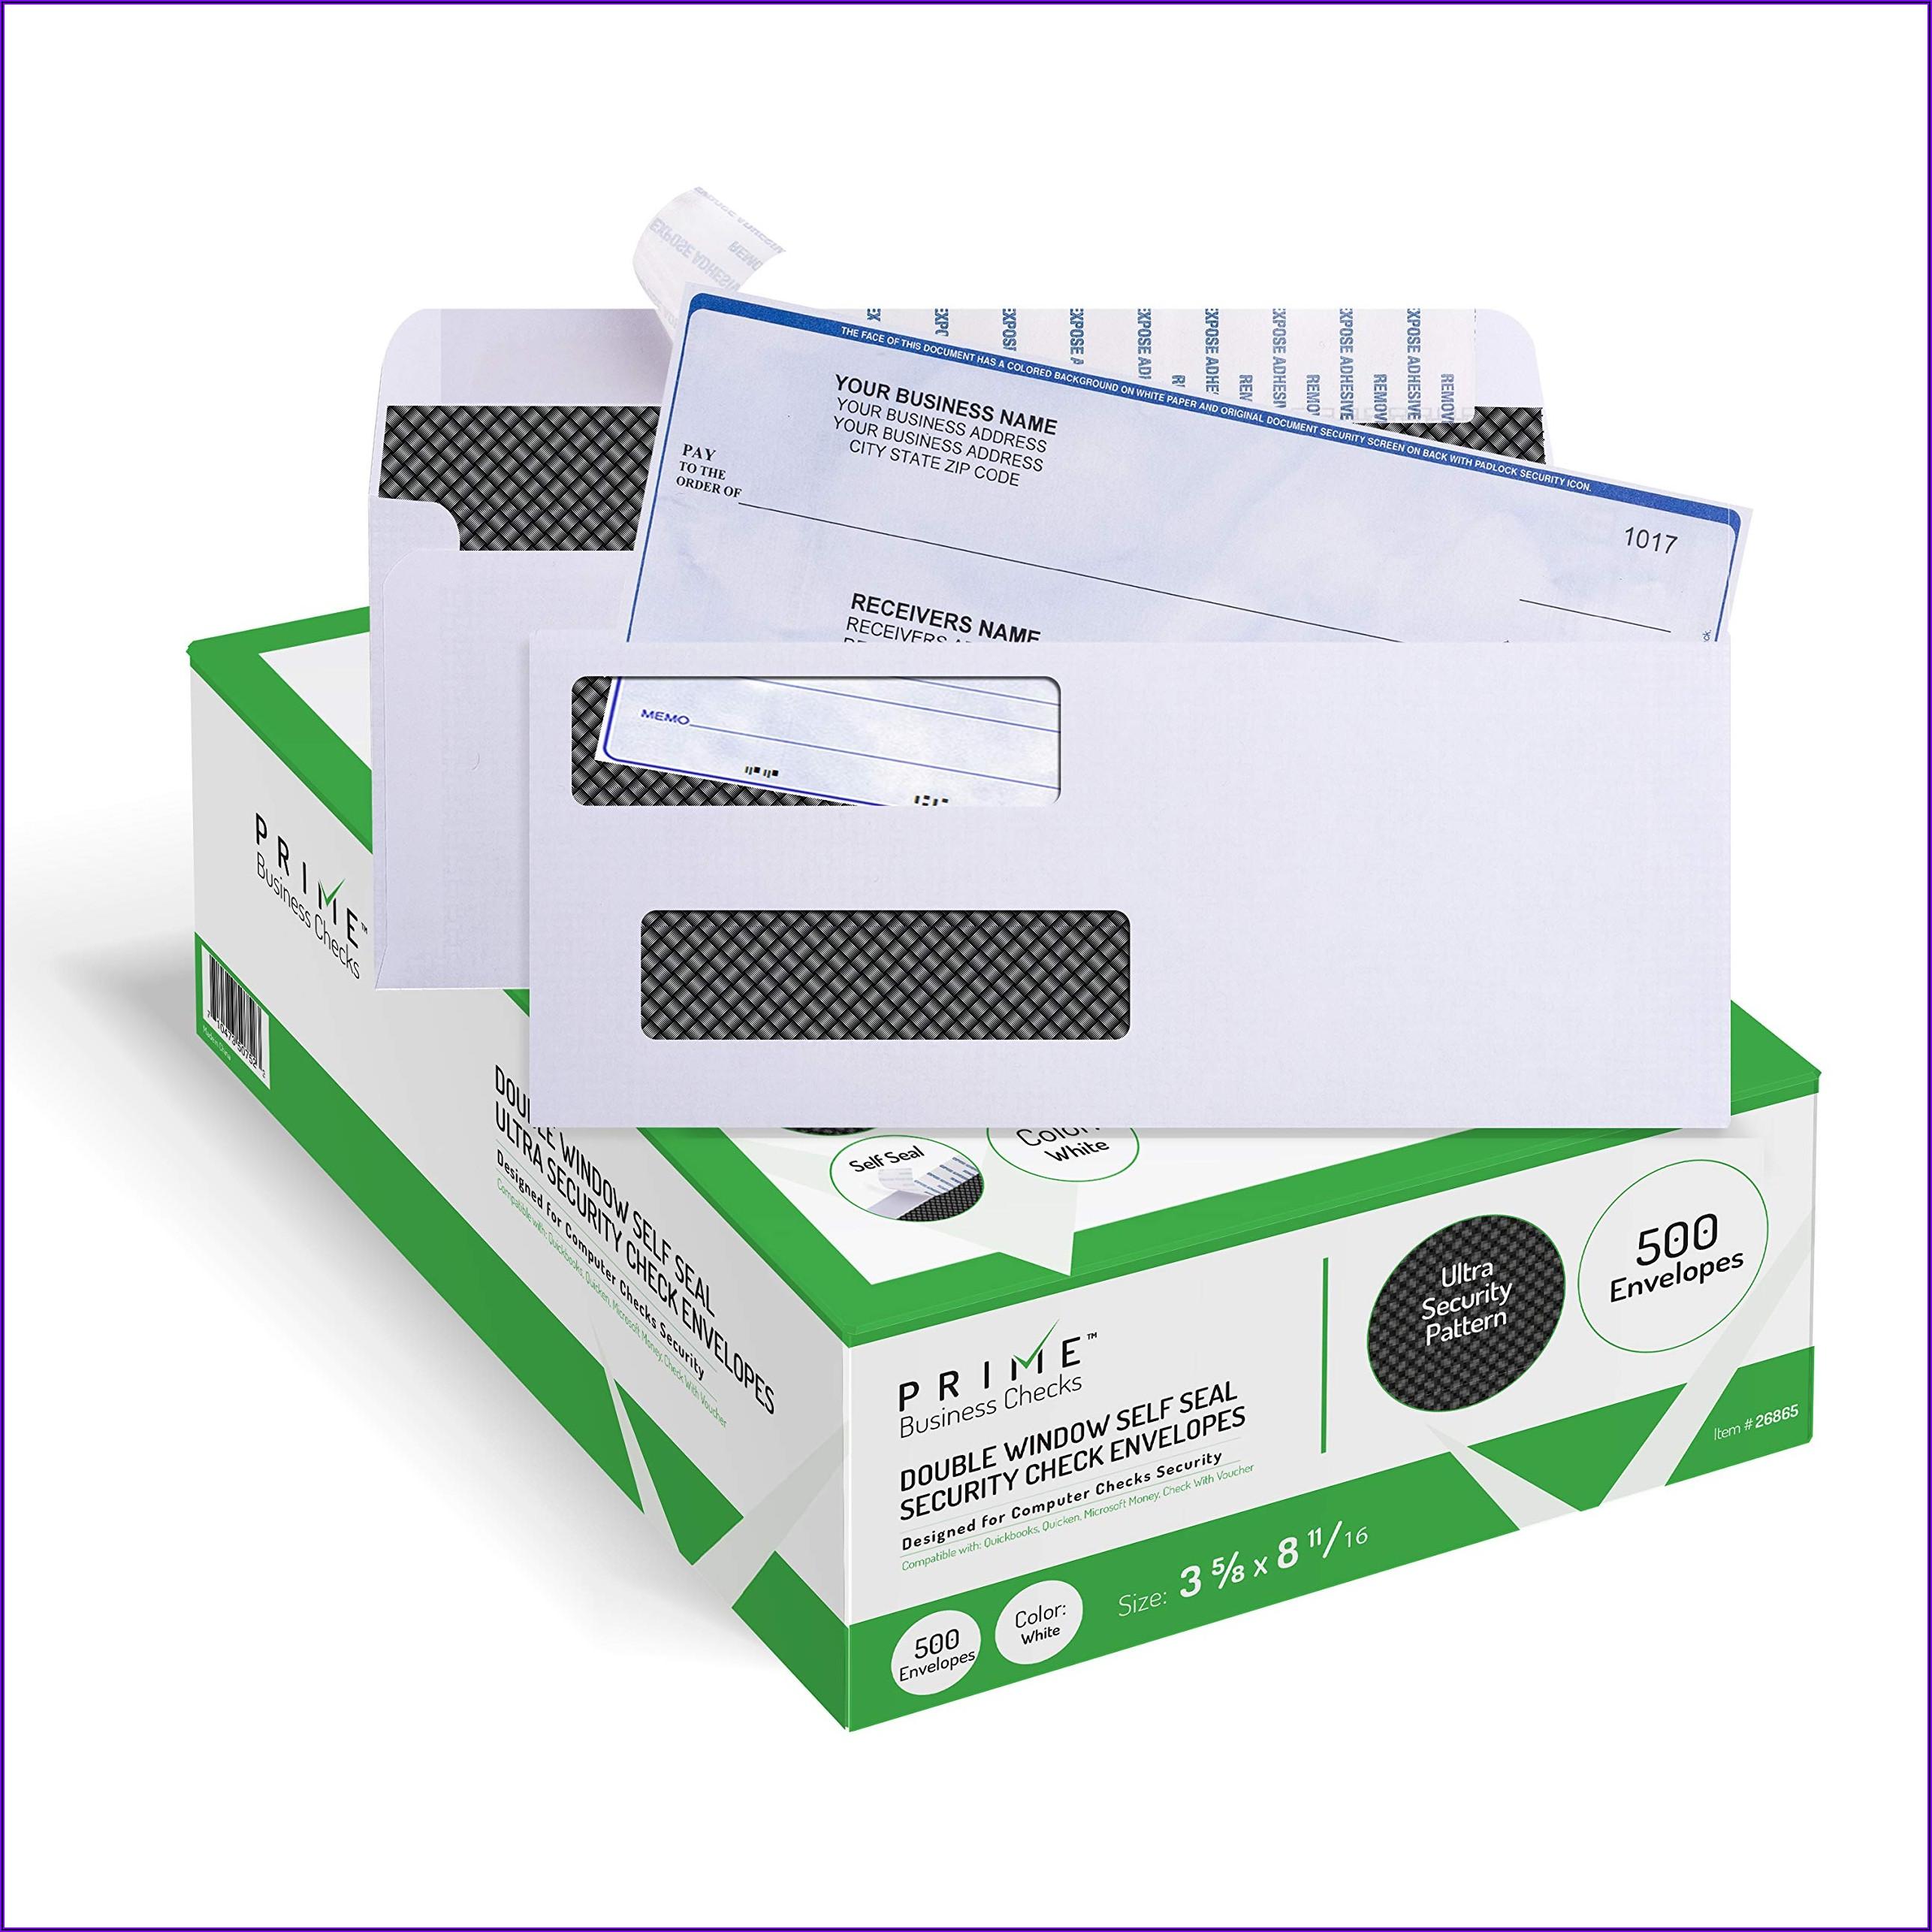 Double Window Business Envelopes